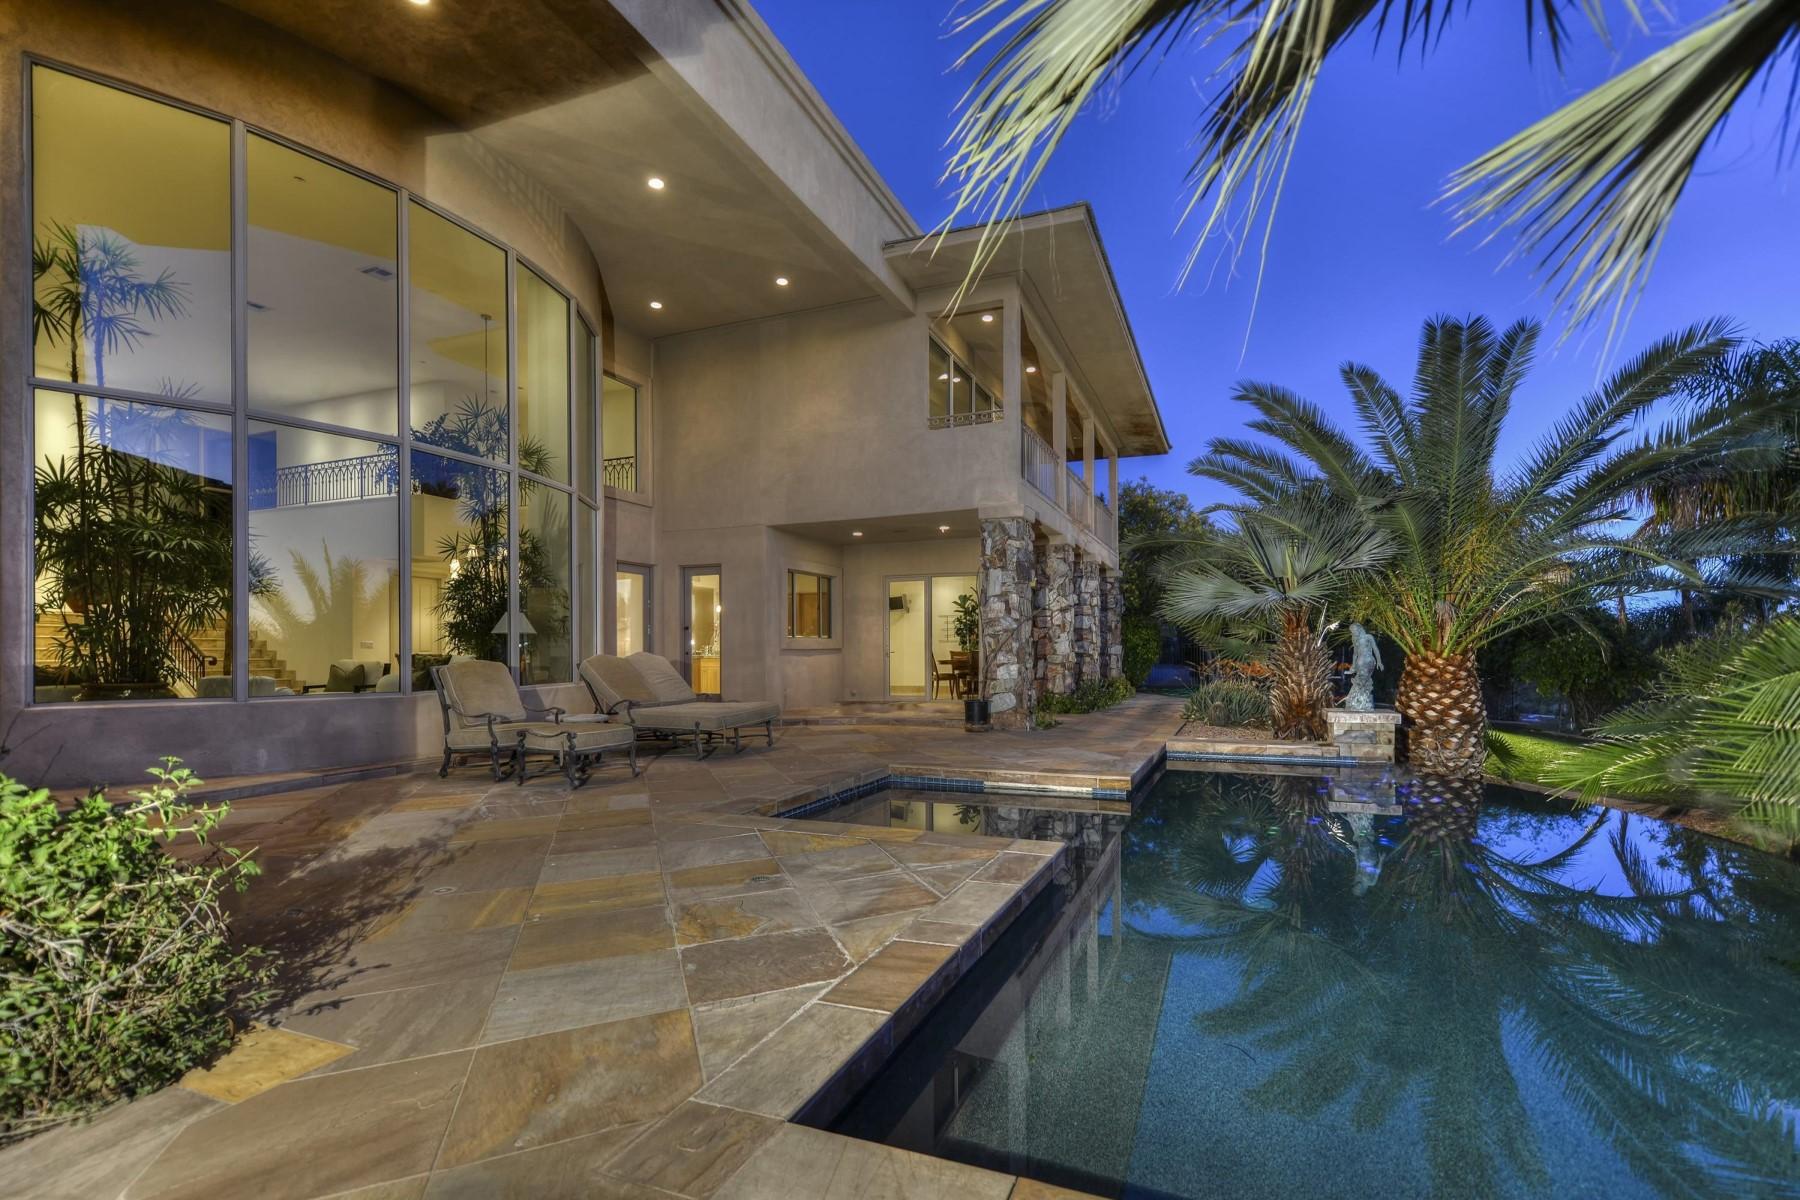 Casa Unifamiliar por un Venta en Stunning gated home with spectacular views 6038 N 44th St Paradise Valley, Arizona, 85253 Estados Unidos